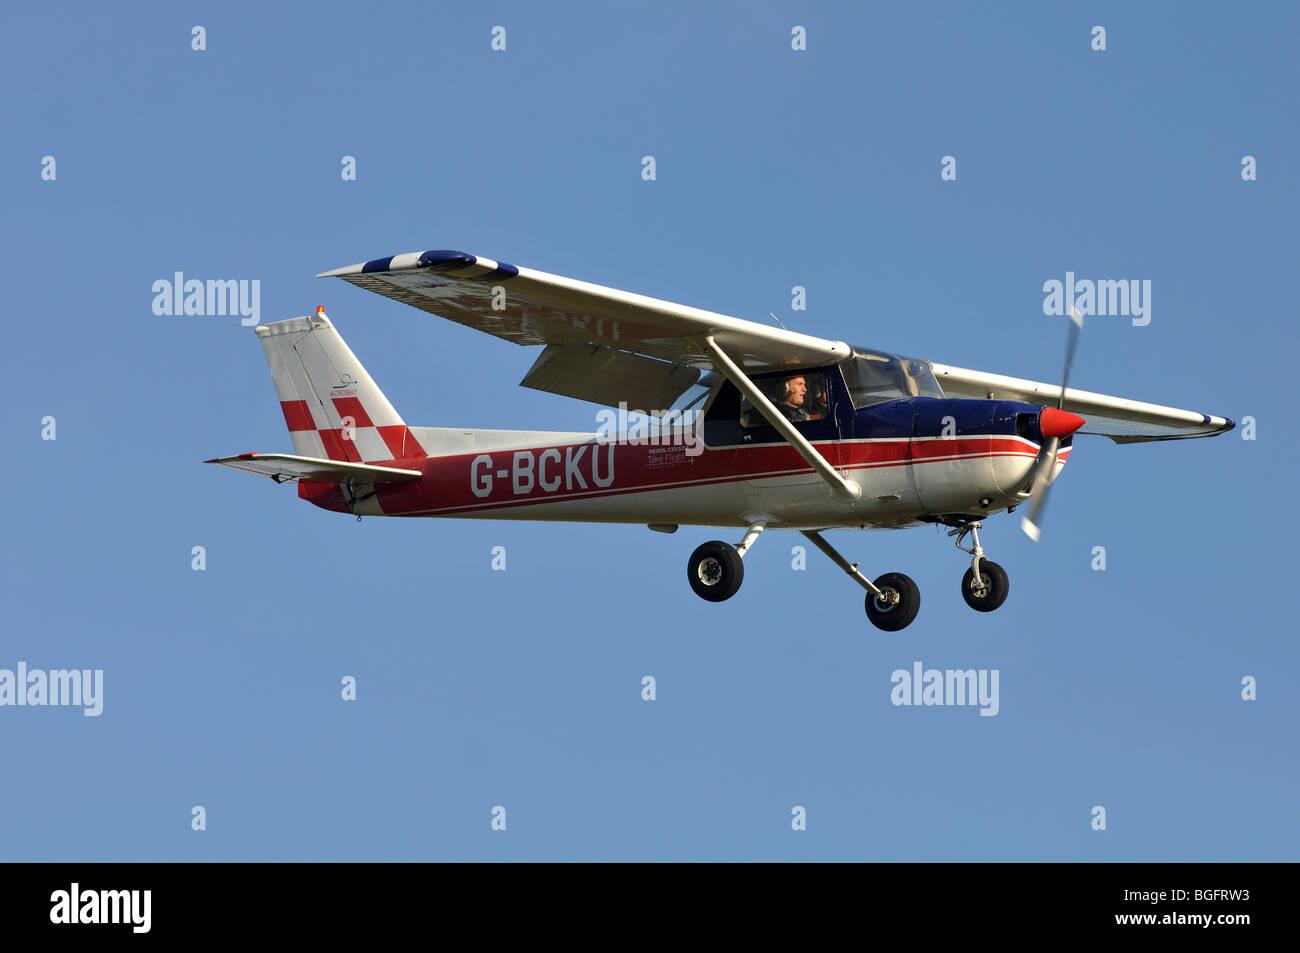 Reims Cessna FRA 150L aircraft approaching Wellesbourne Airfield, Warwickshire, UK - Stock Image